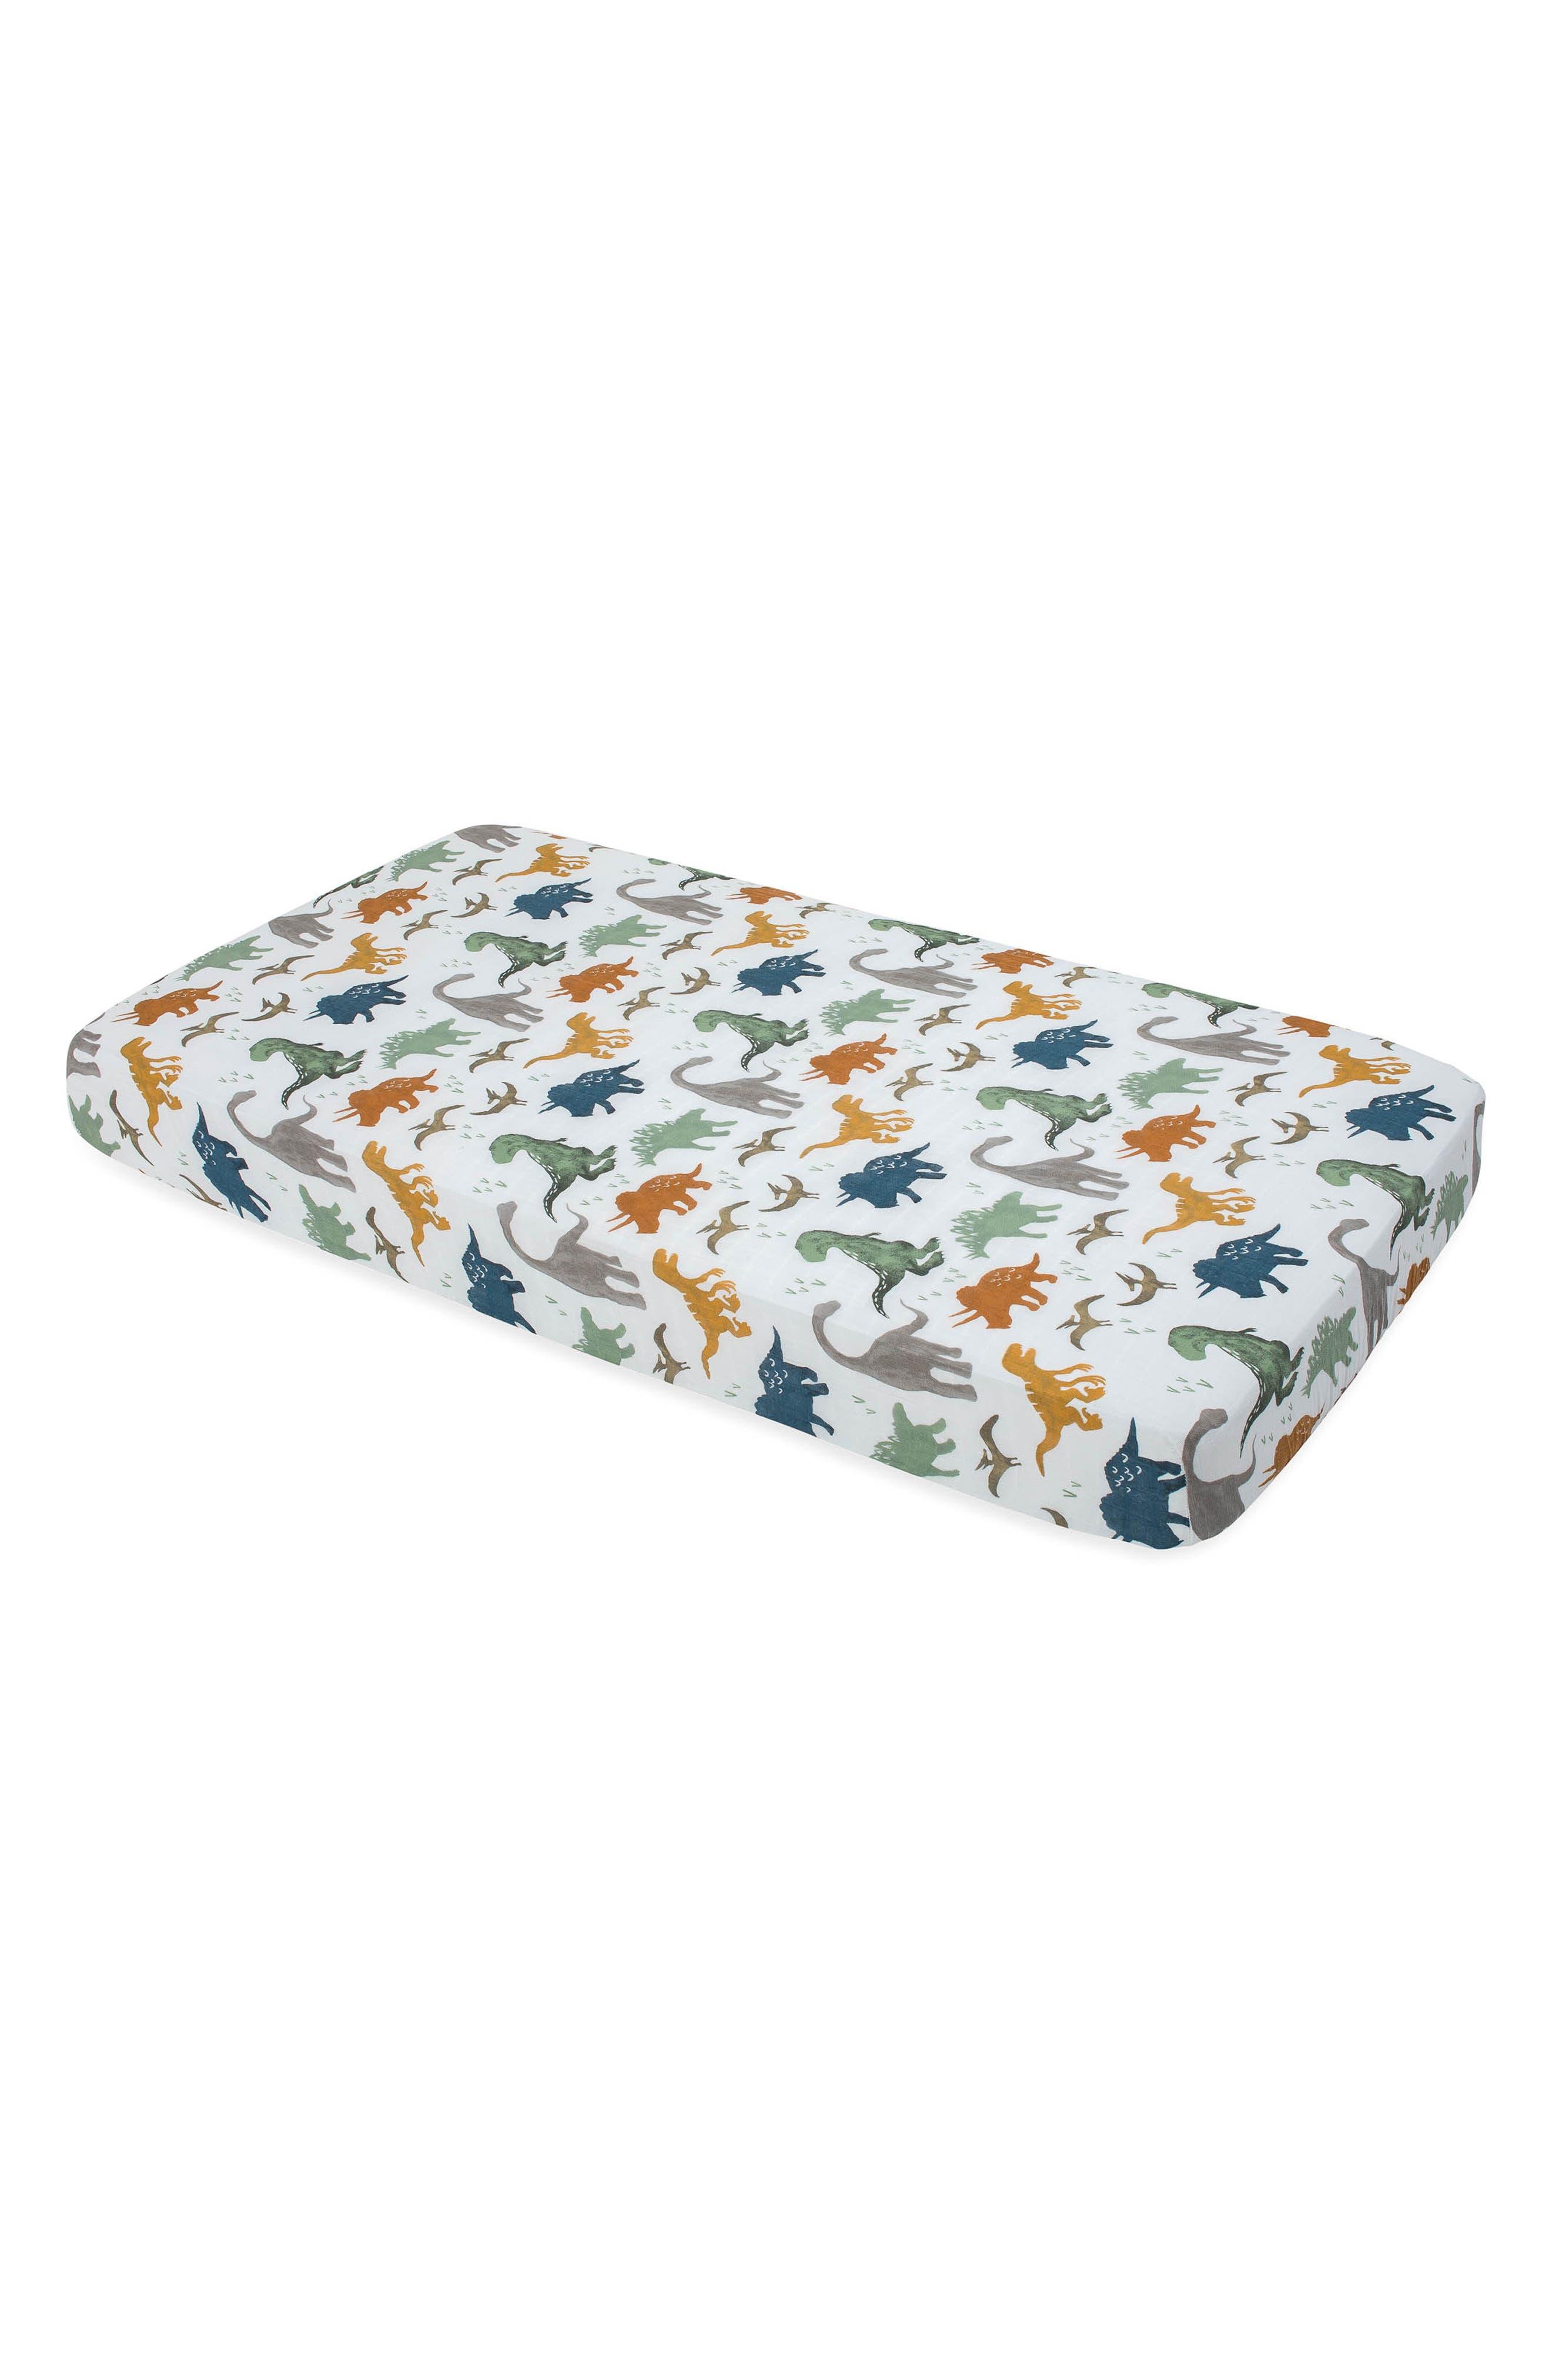 Cotton Muslin Crib Sheet,                         Main,                         color, DINO FRIENDS